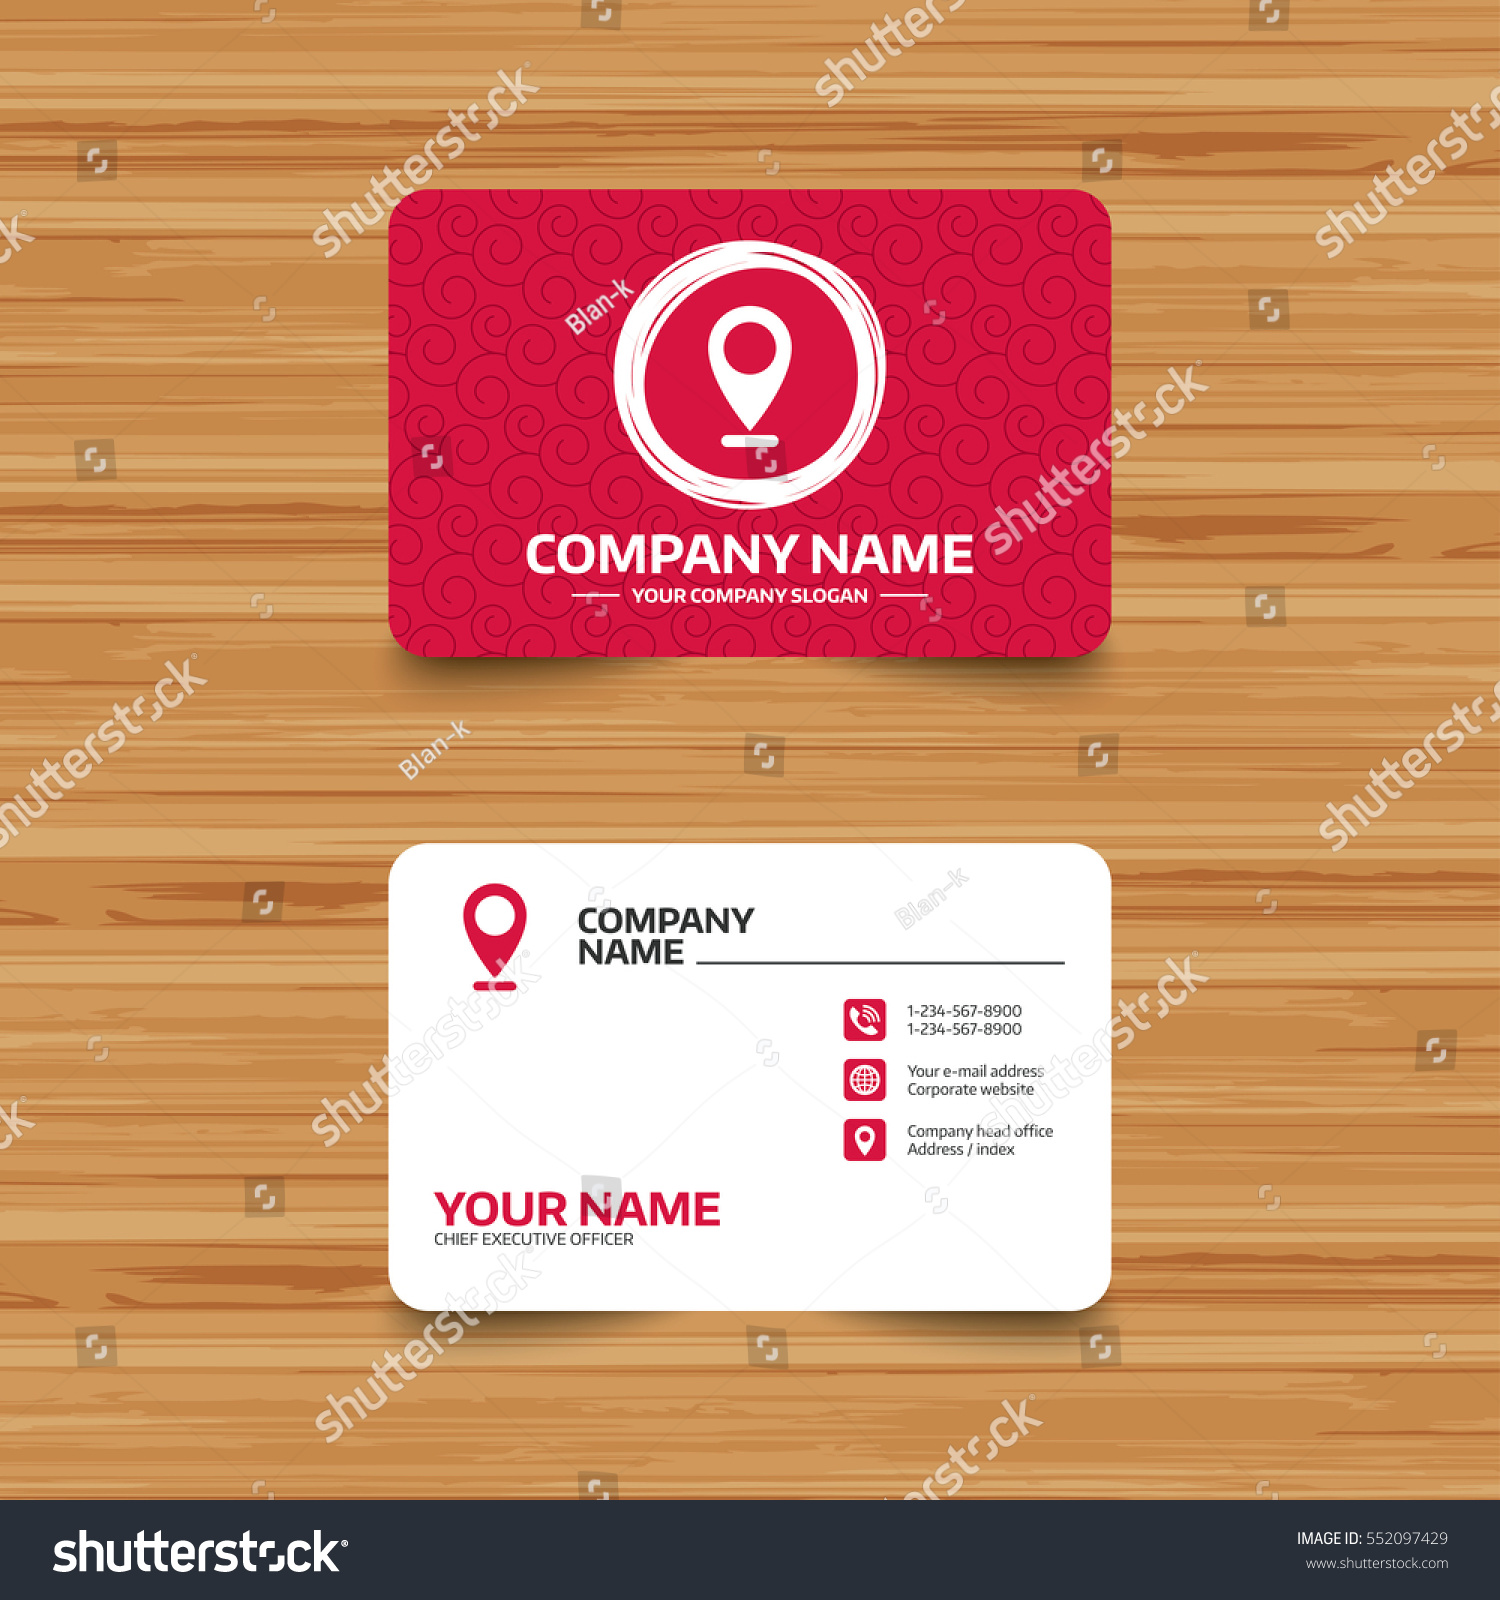 Business Card Template Texture Internet Mark Stock Vector HD ...